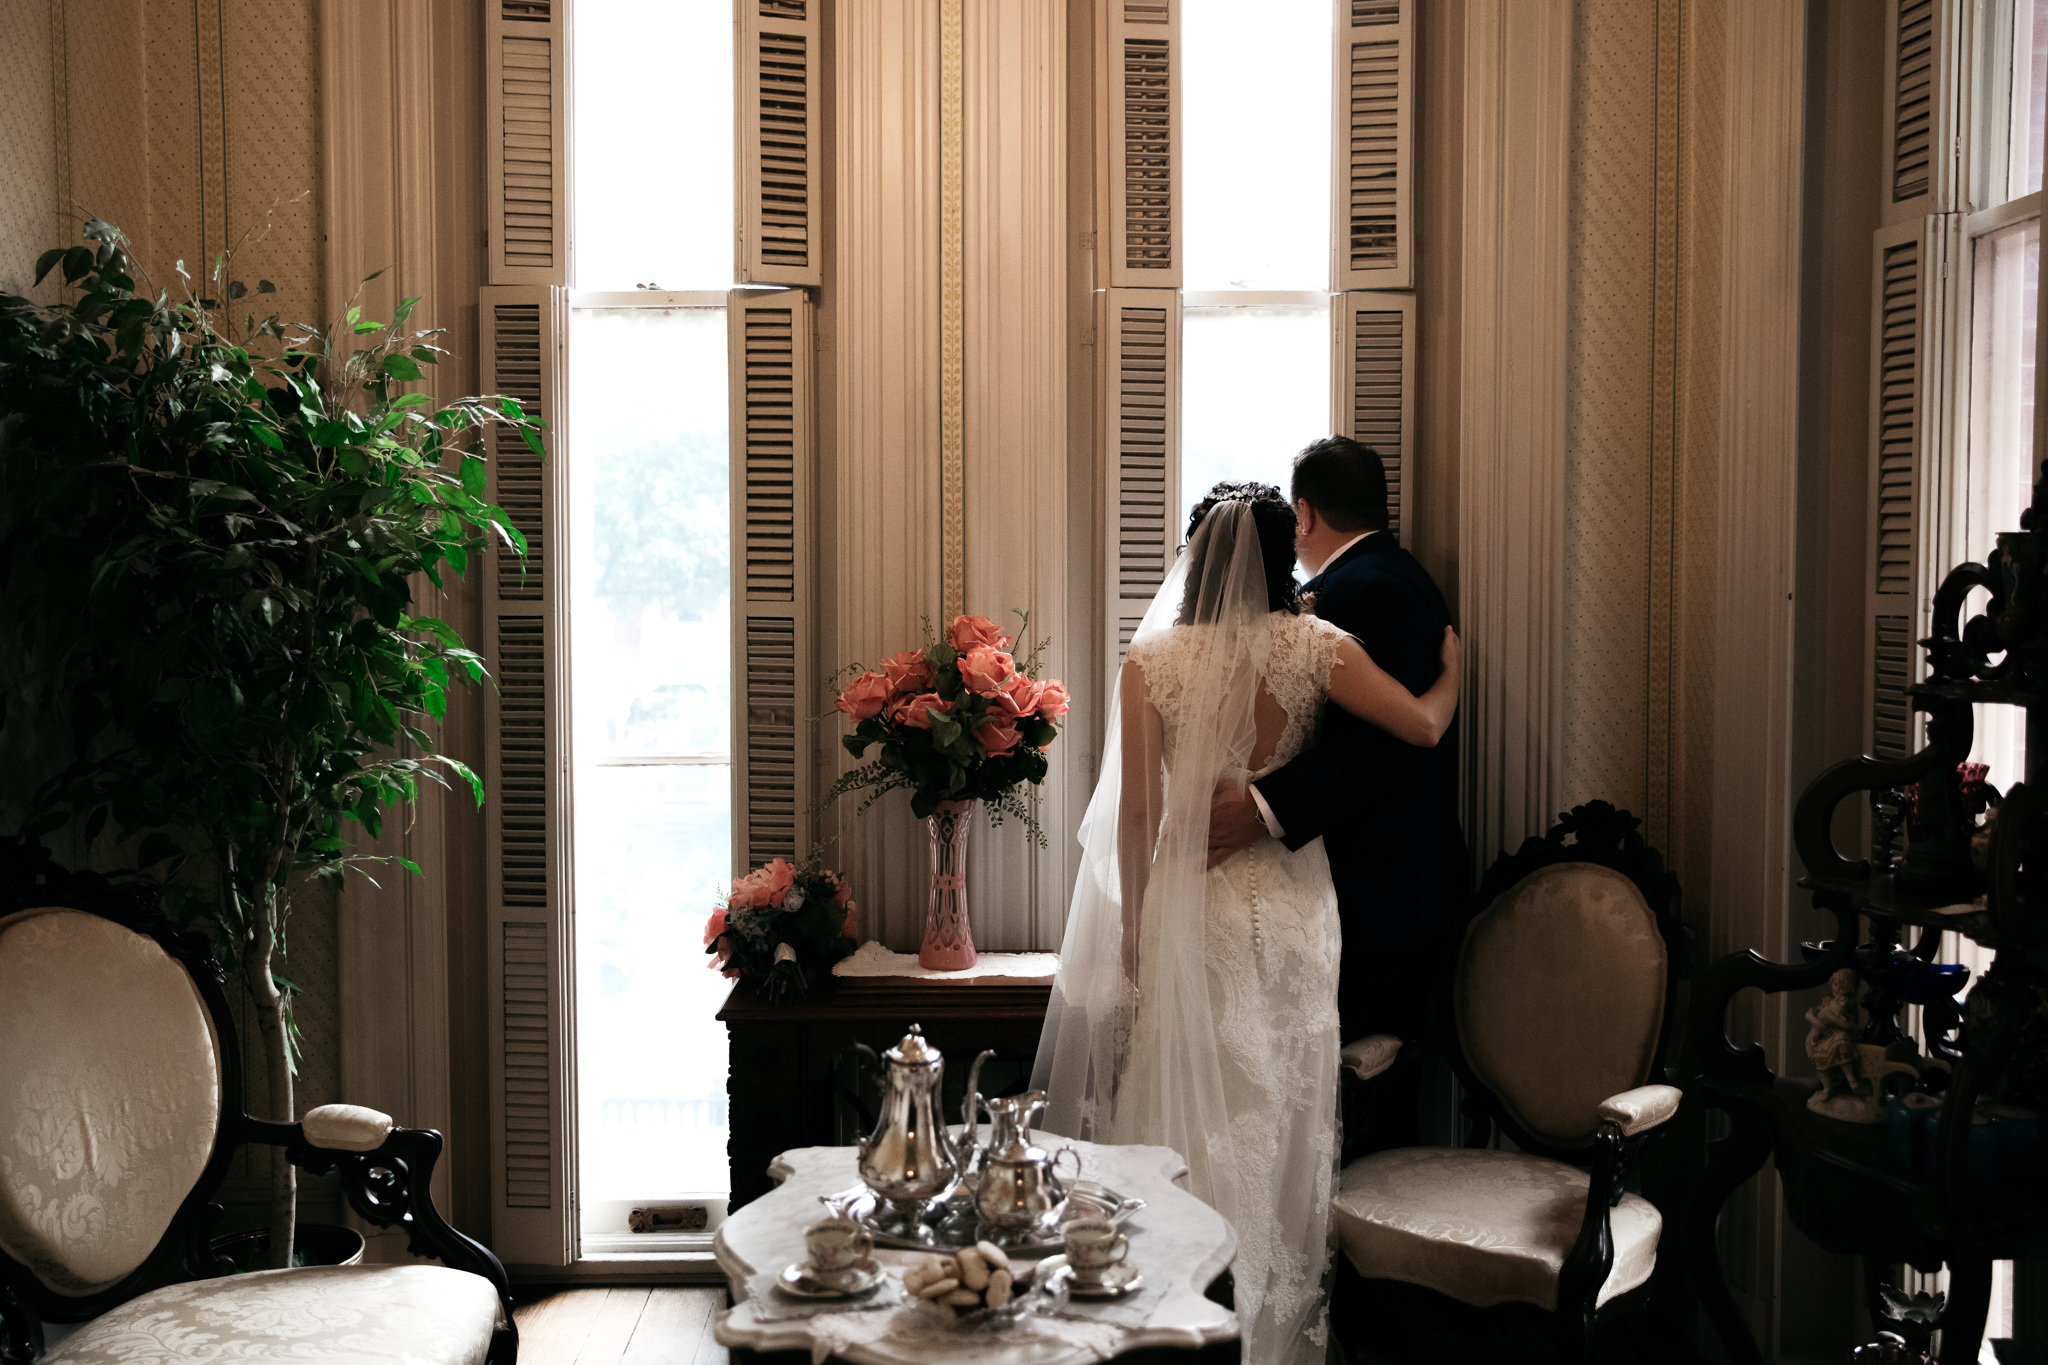 woodruff-fontaine-wedding-venue-memphis-thewarmtharoundyou-brenda-taylor-2-2.jpg